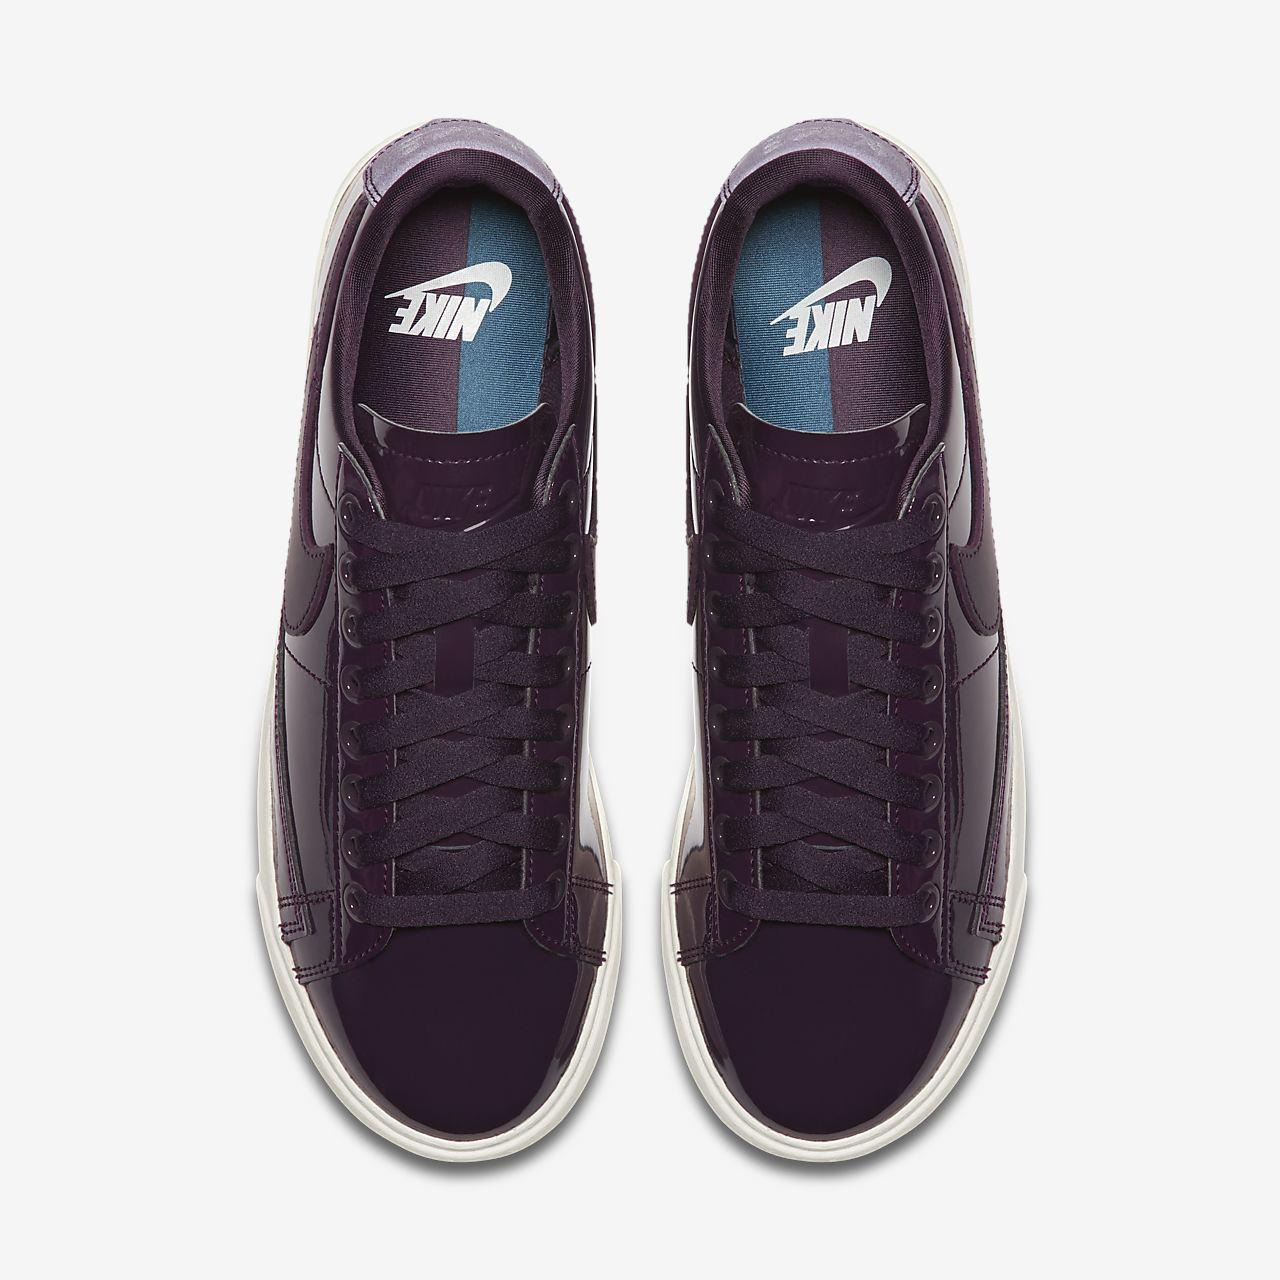 ... The Nike Blazer Premium Low QS Nocturne Women's Shoe